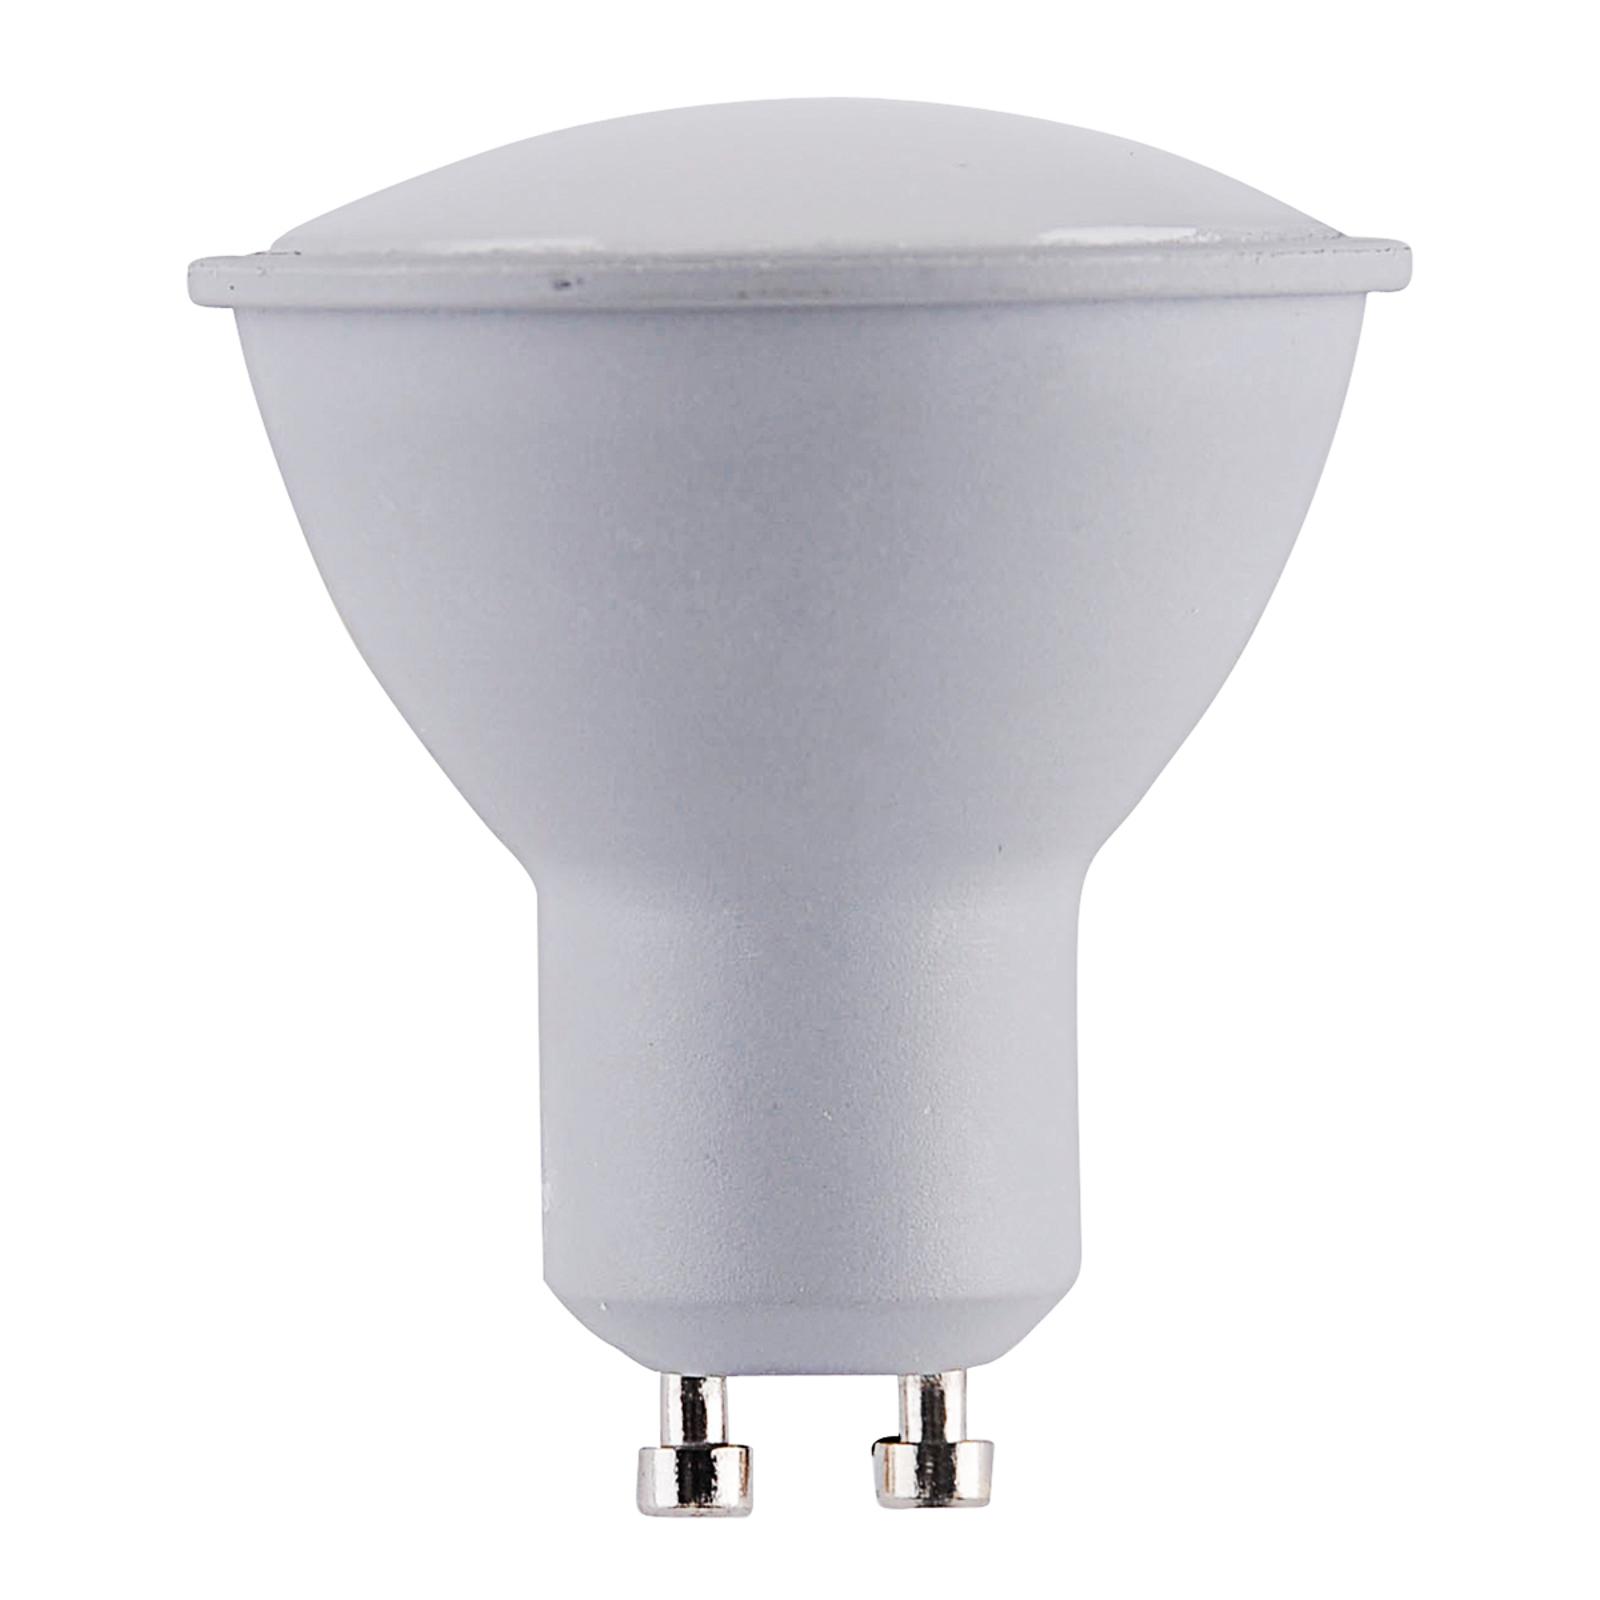 GU10 3W 830 LED żarówka refl. RGB 120°